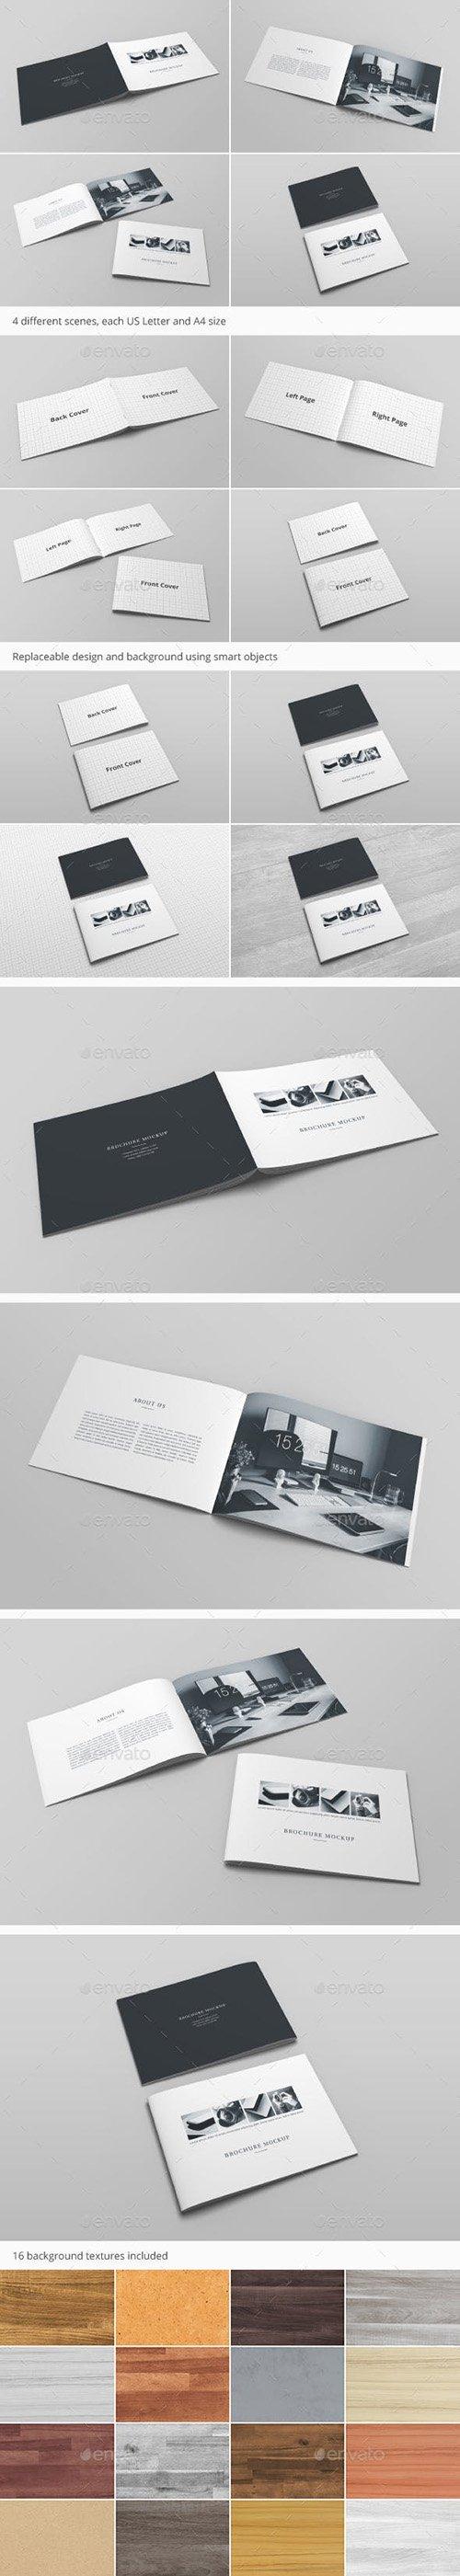 GR - Brochure Catalog Mockup Vol. 3 21420659